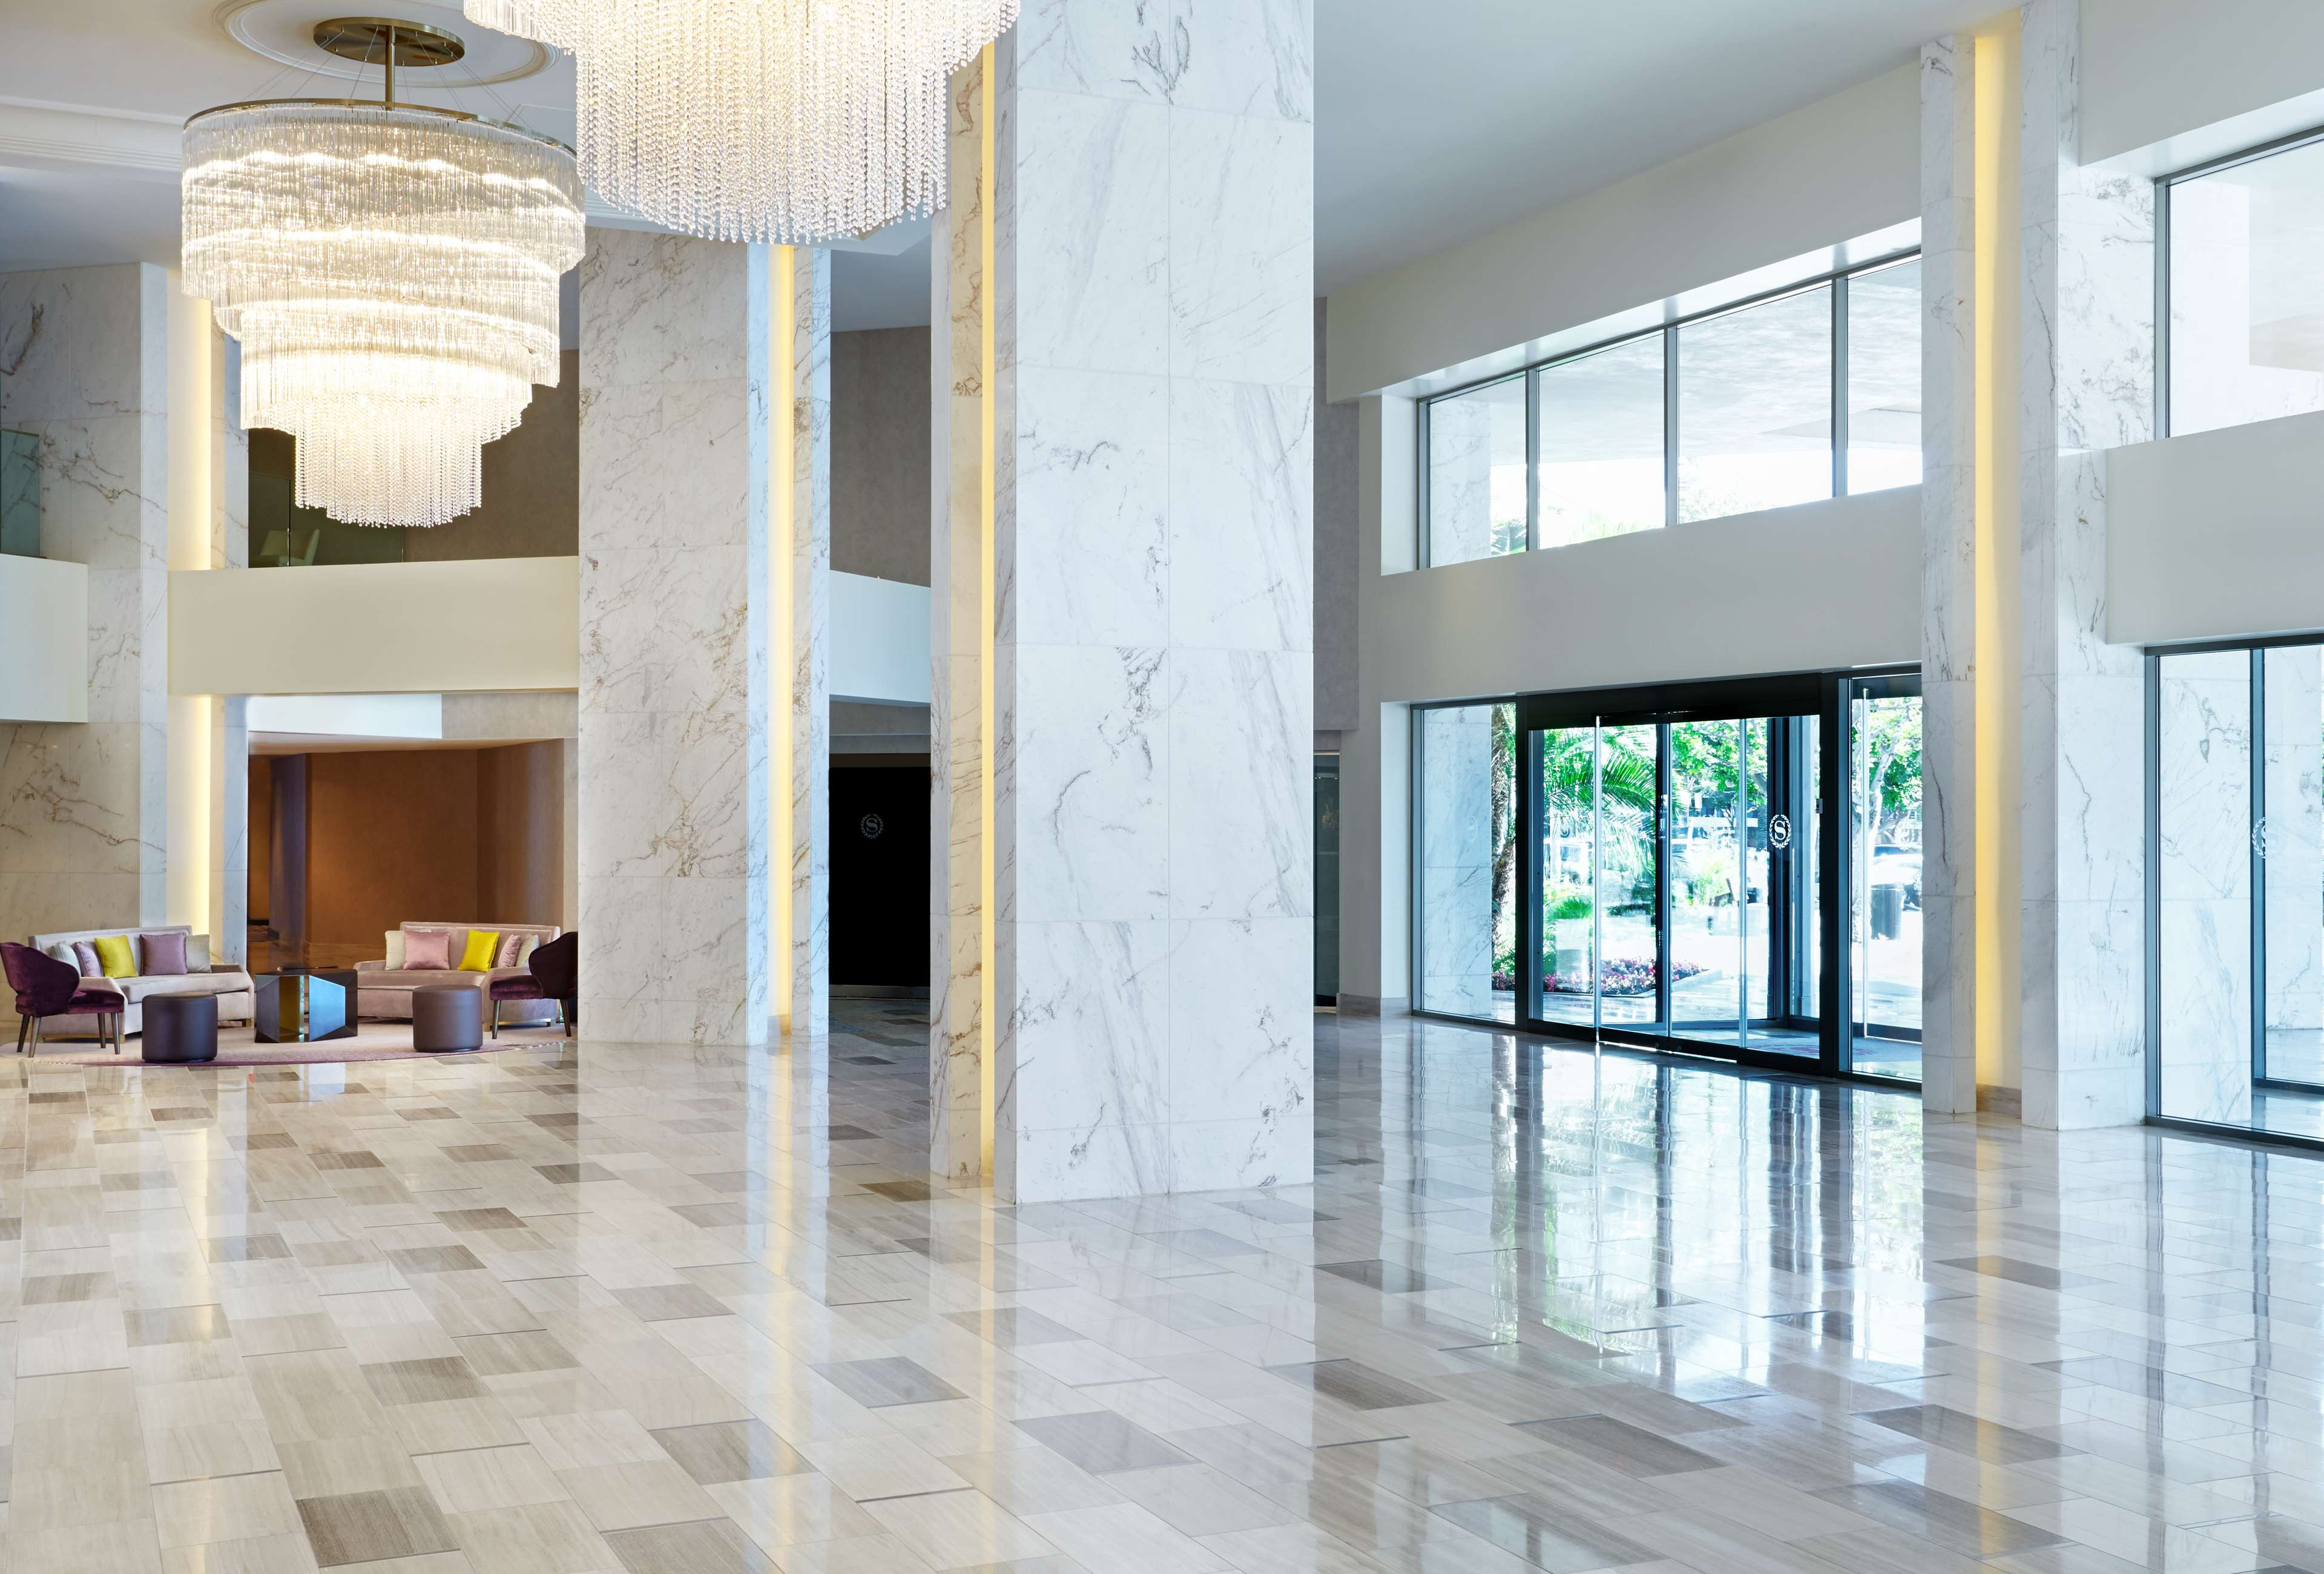 Sheraton Gateway Los Angeles Hotel image 3